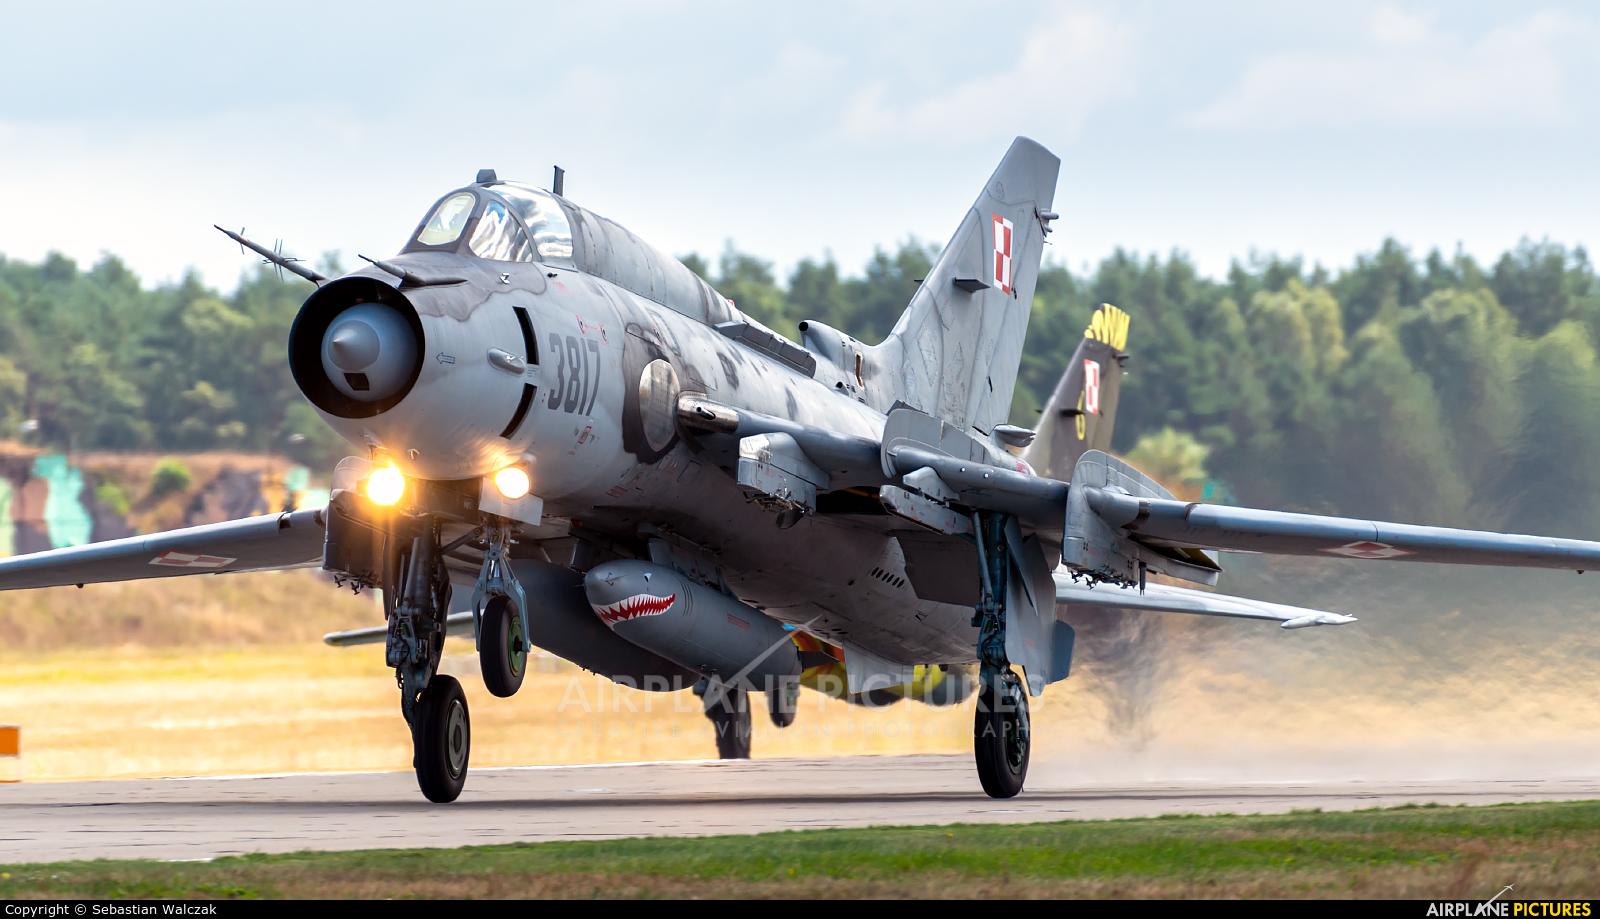 Poland - Air Force 3817 aircraft at Mirosławiec